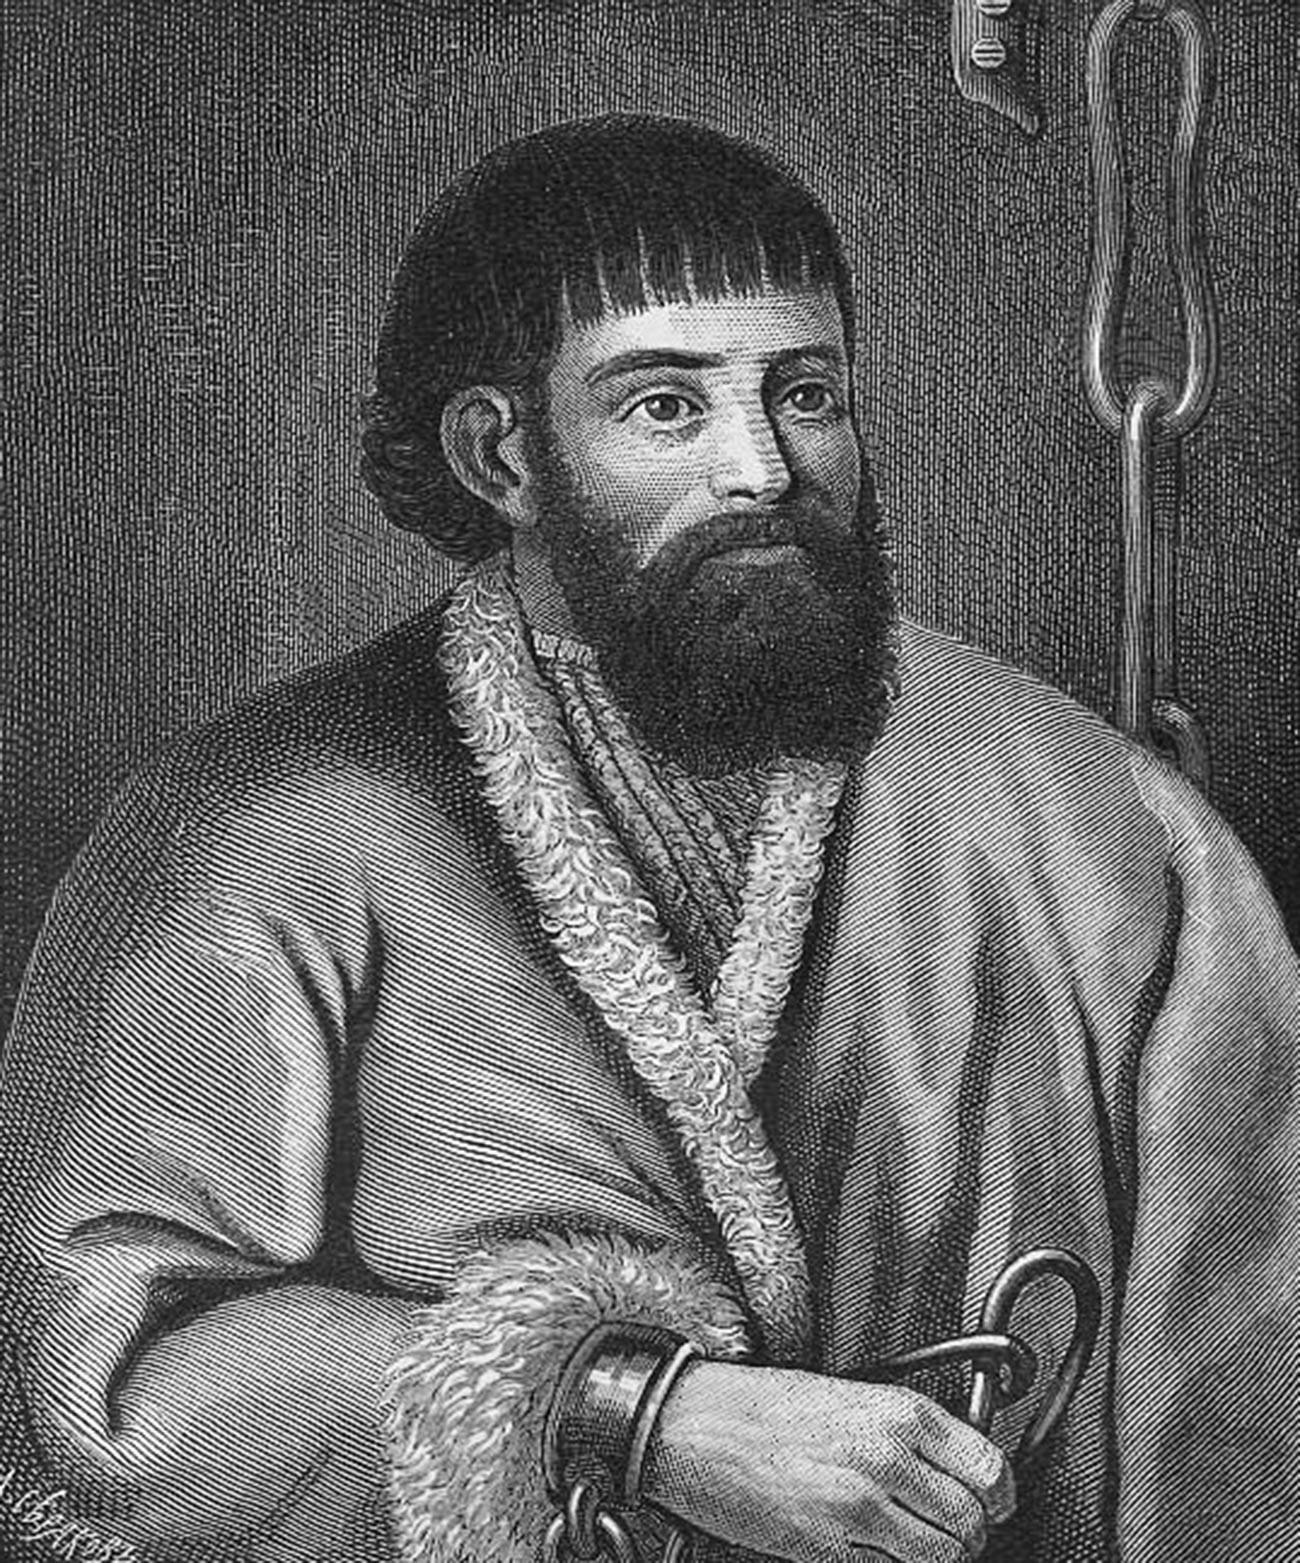 Емељан Пугачов